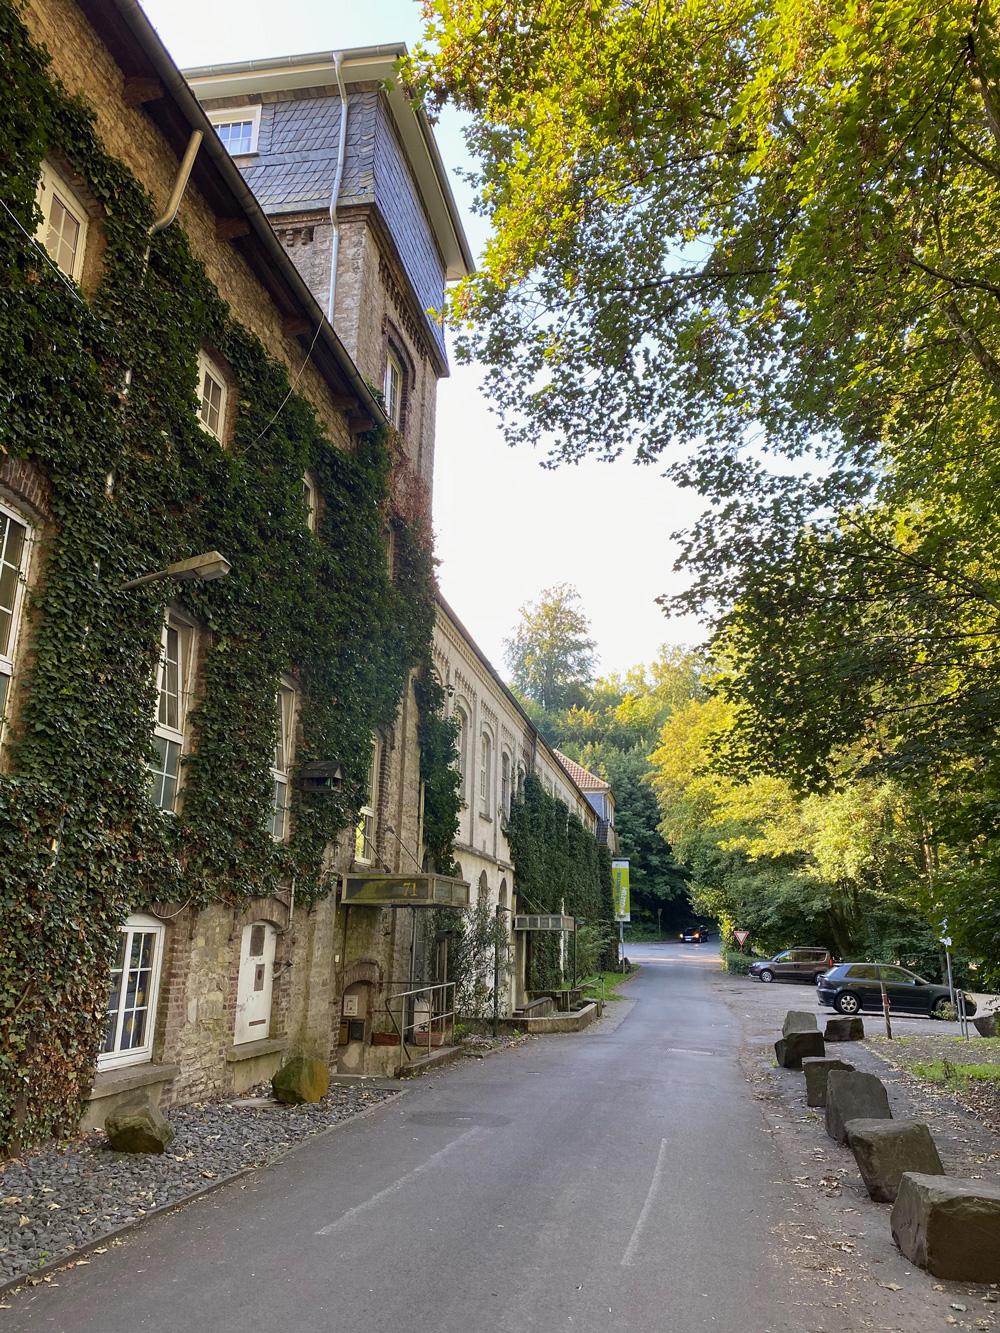 Papiermühle Alte Dombach - Walk and Wonder